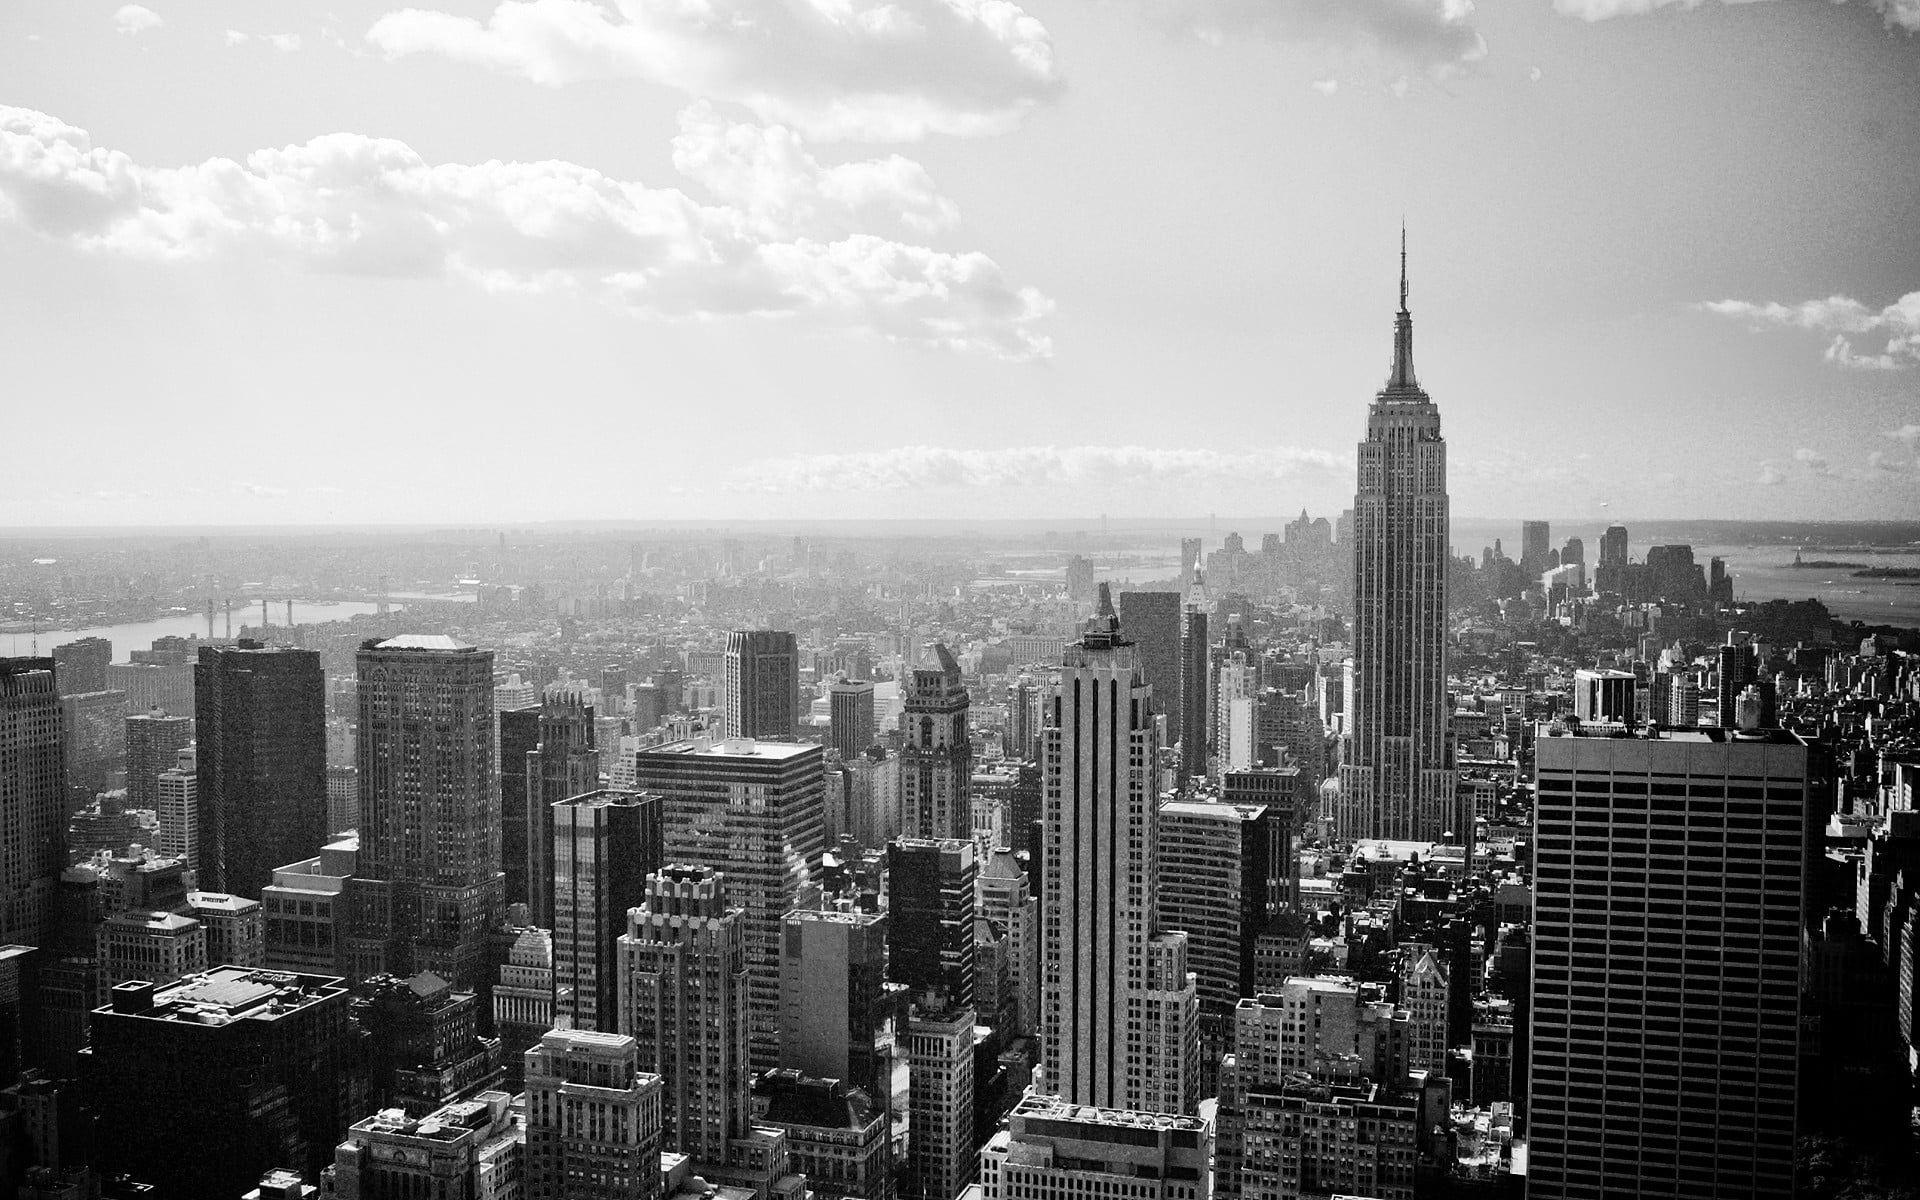 Empire State New York Building Cityscape City New York City Empire State Building Landscape Wallpaper Black And White Landscape Black And White Wallpaper